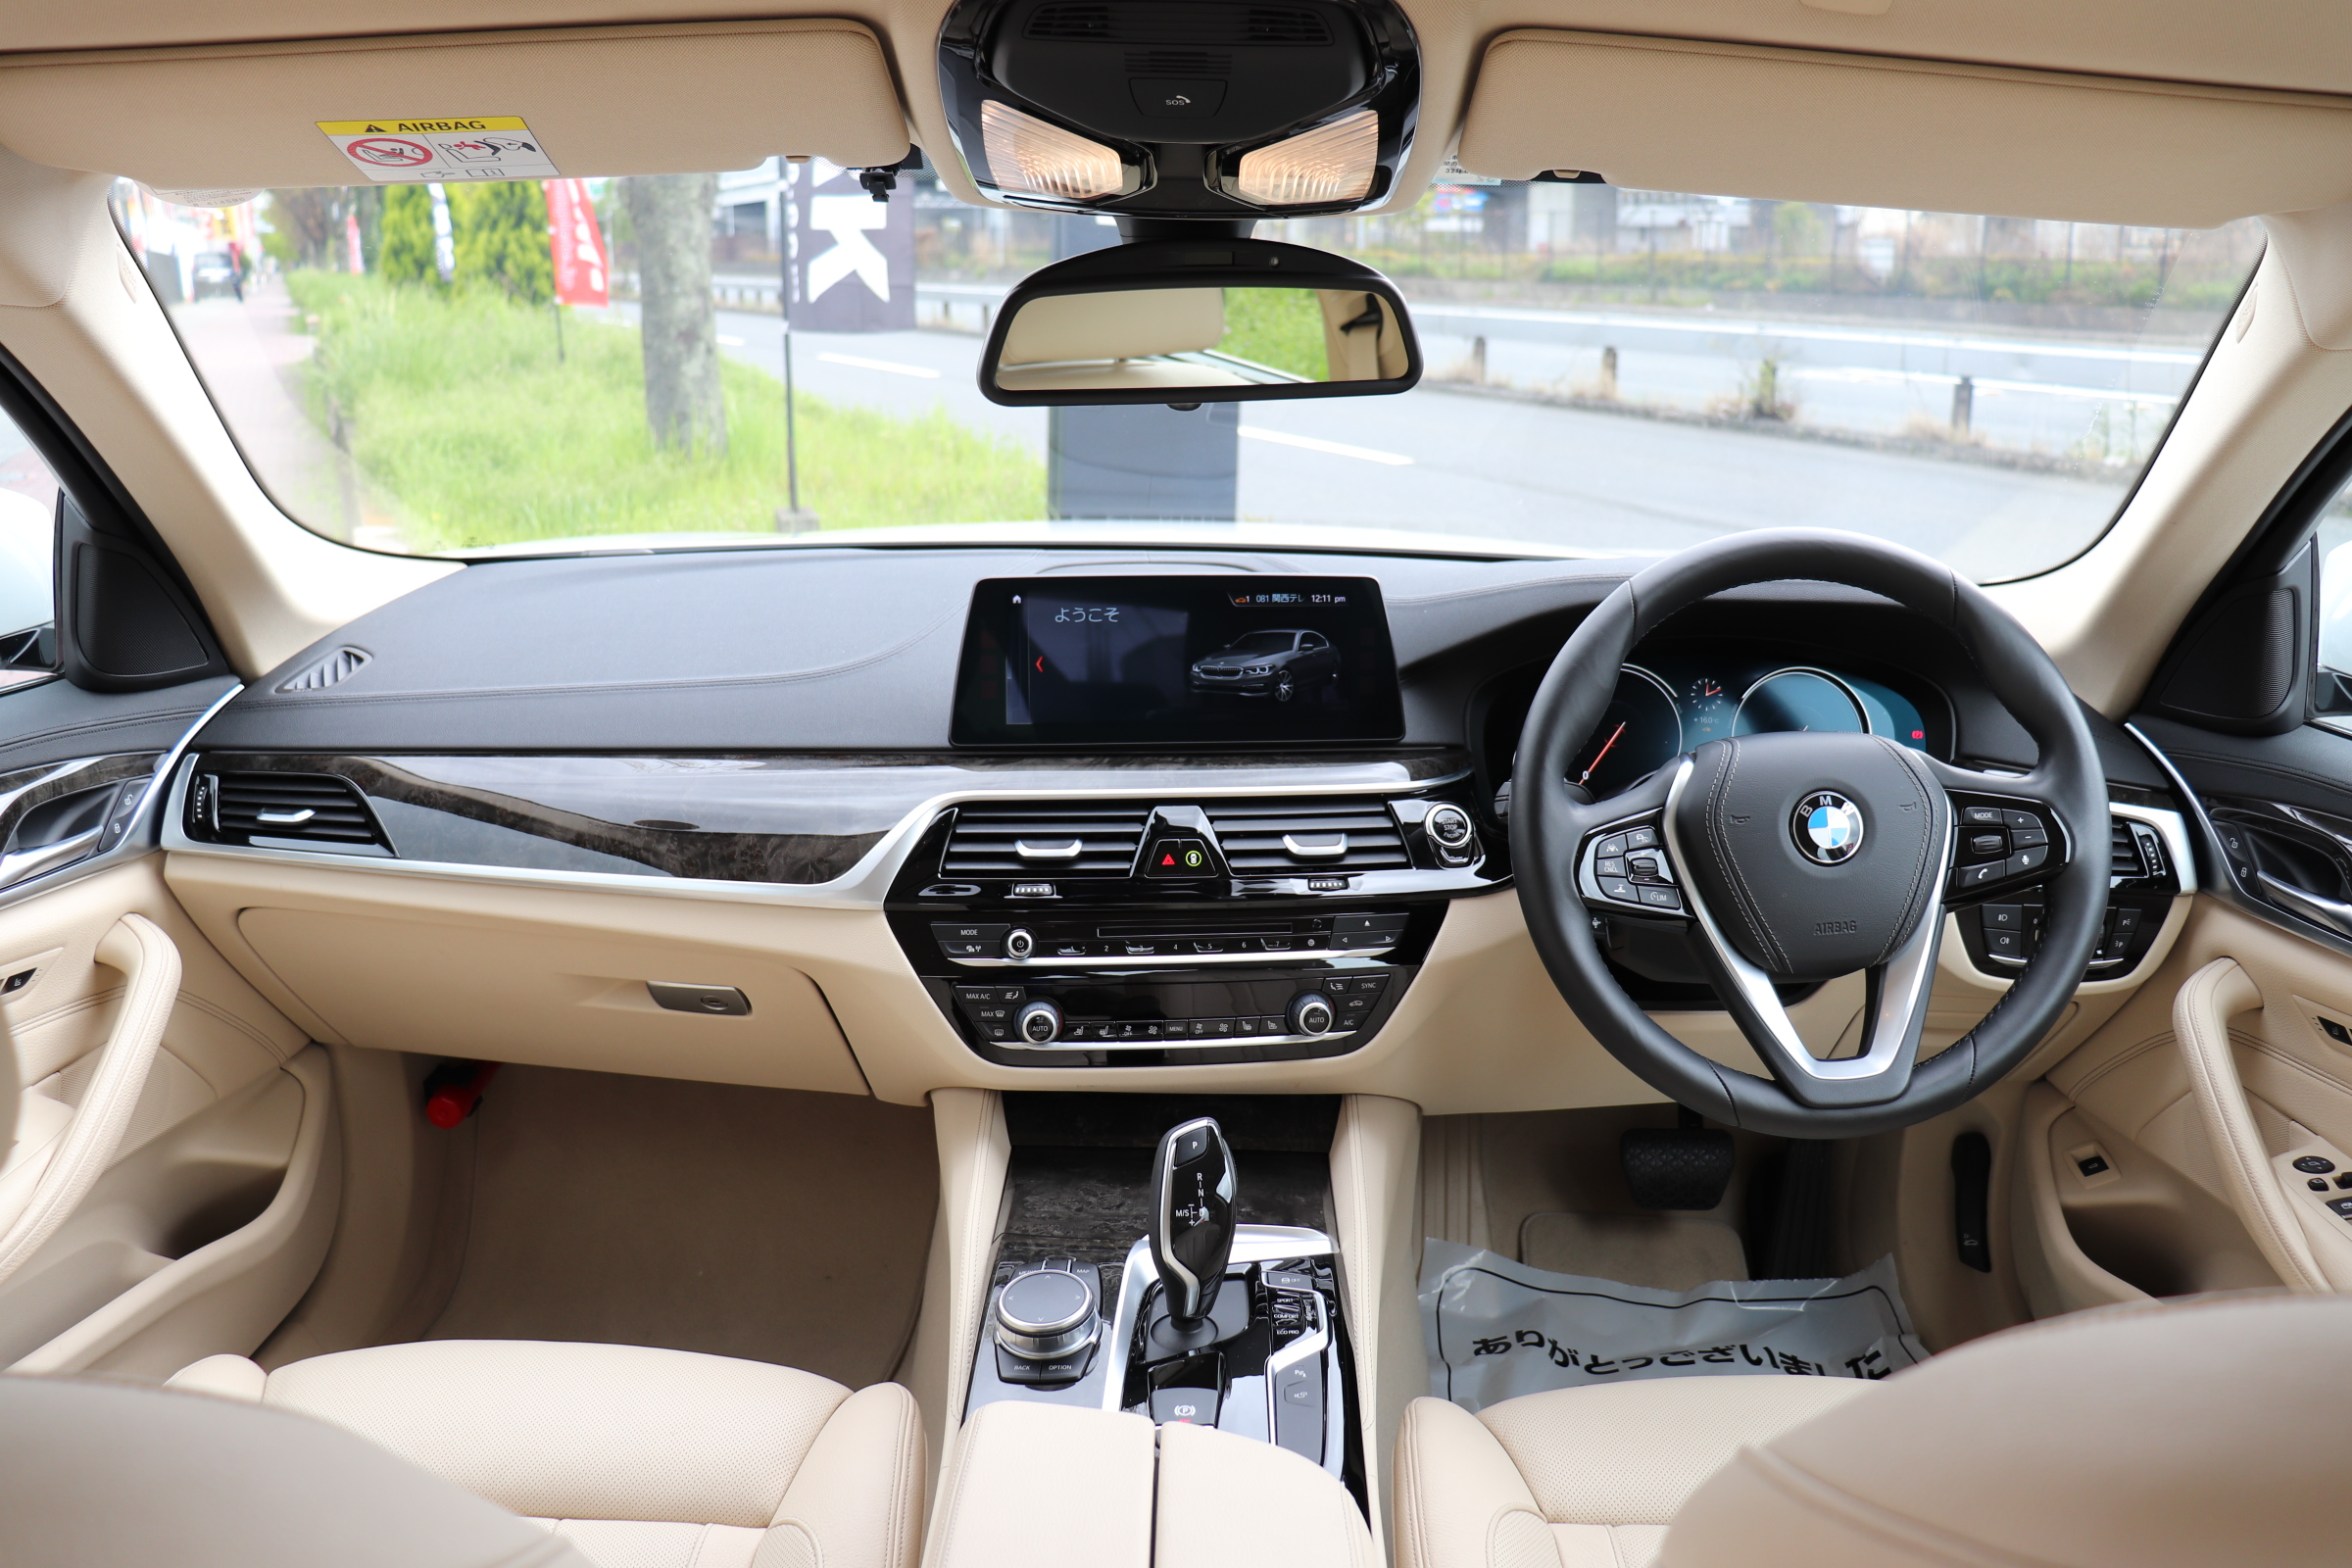 540i ラグジュアリー コンフォート&イノベーションP ワンオナ HUD Sクローズドア ジェスチャー ディスプレイK車両画像10